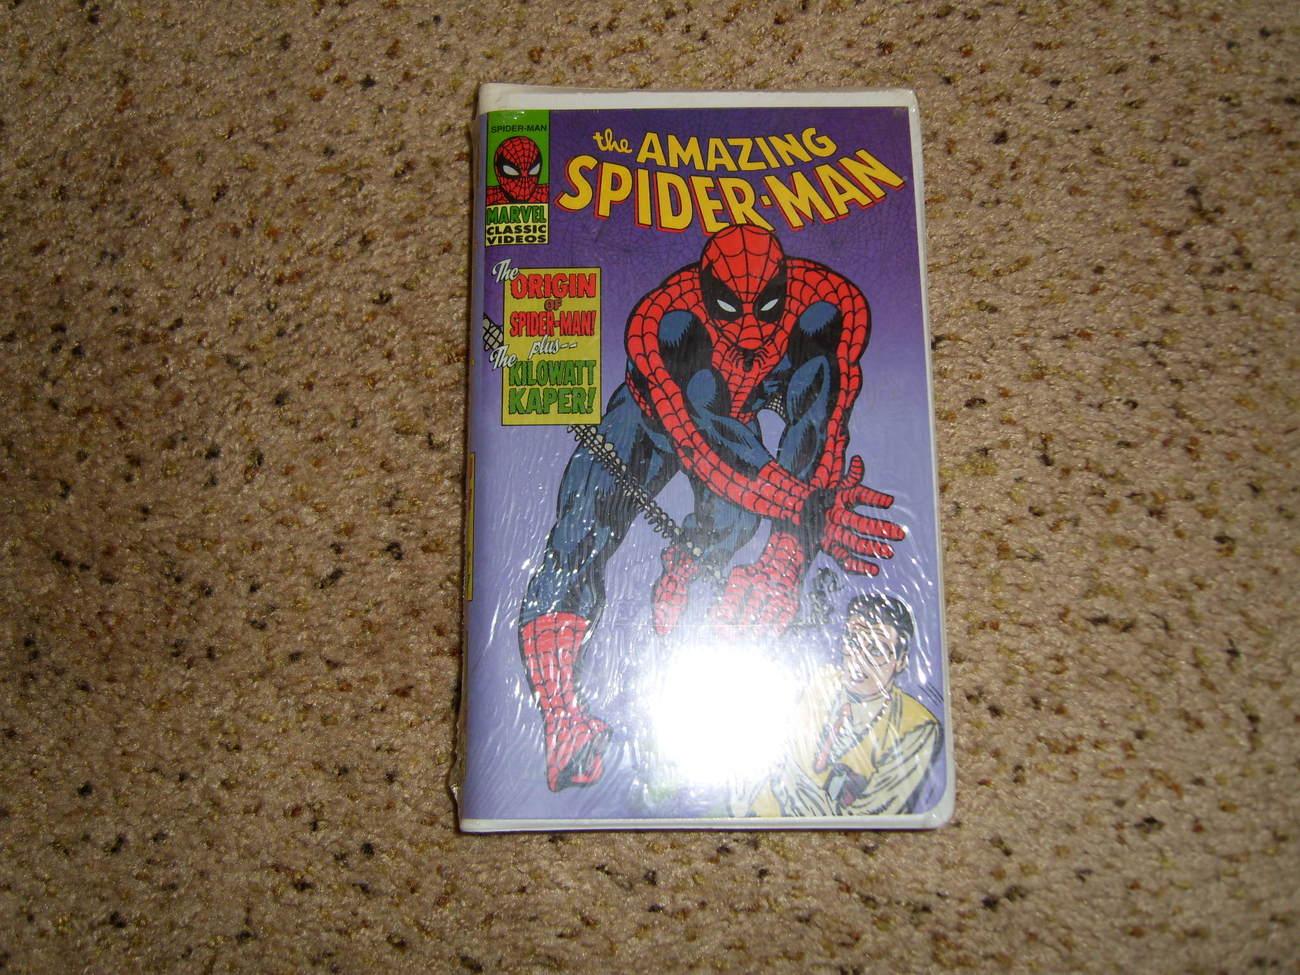 Spiderman vhs